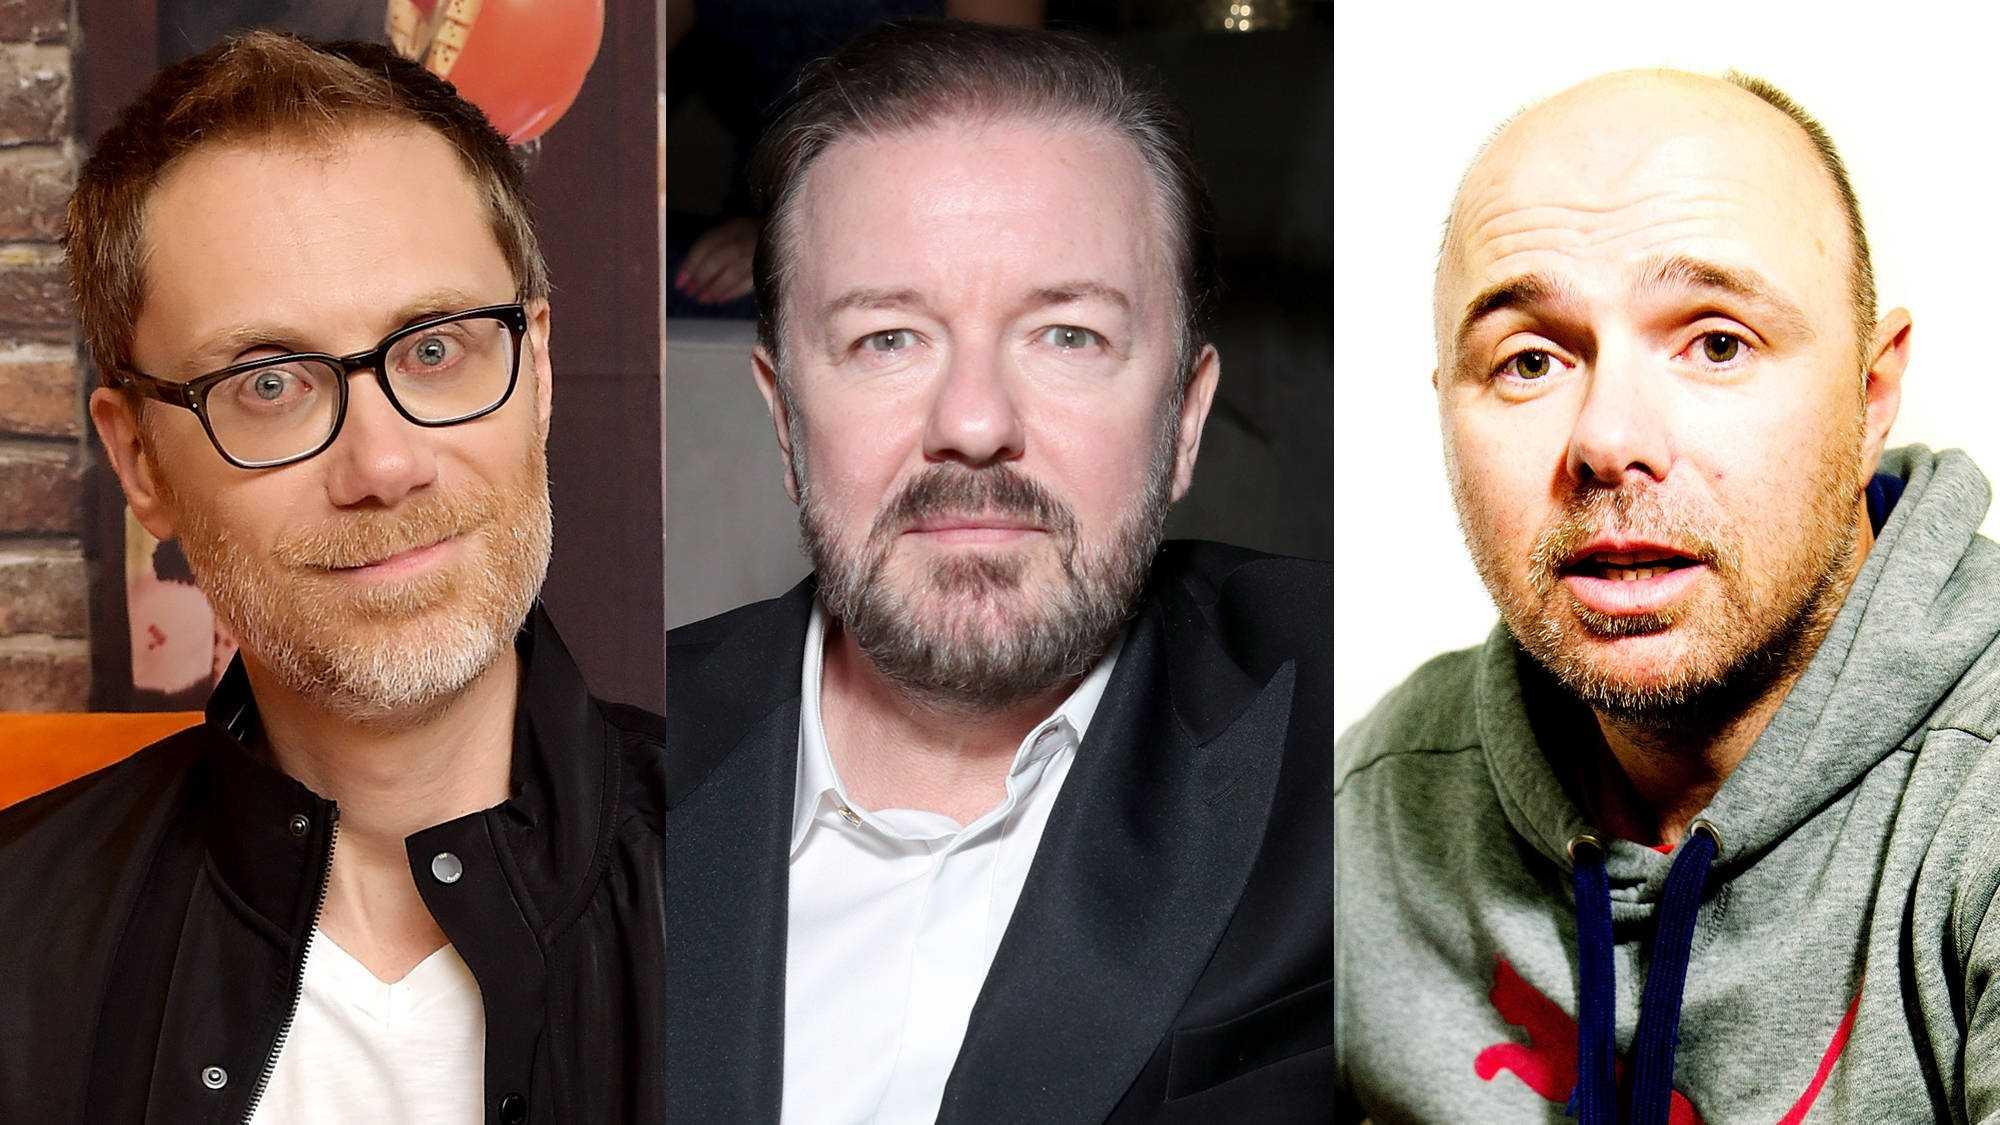 The Ricky Gervais Show cast